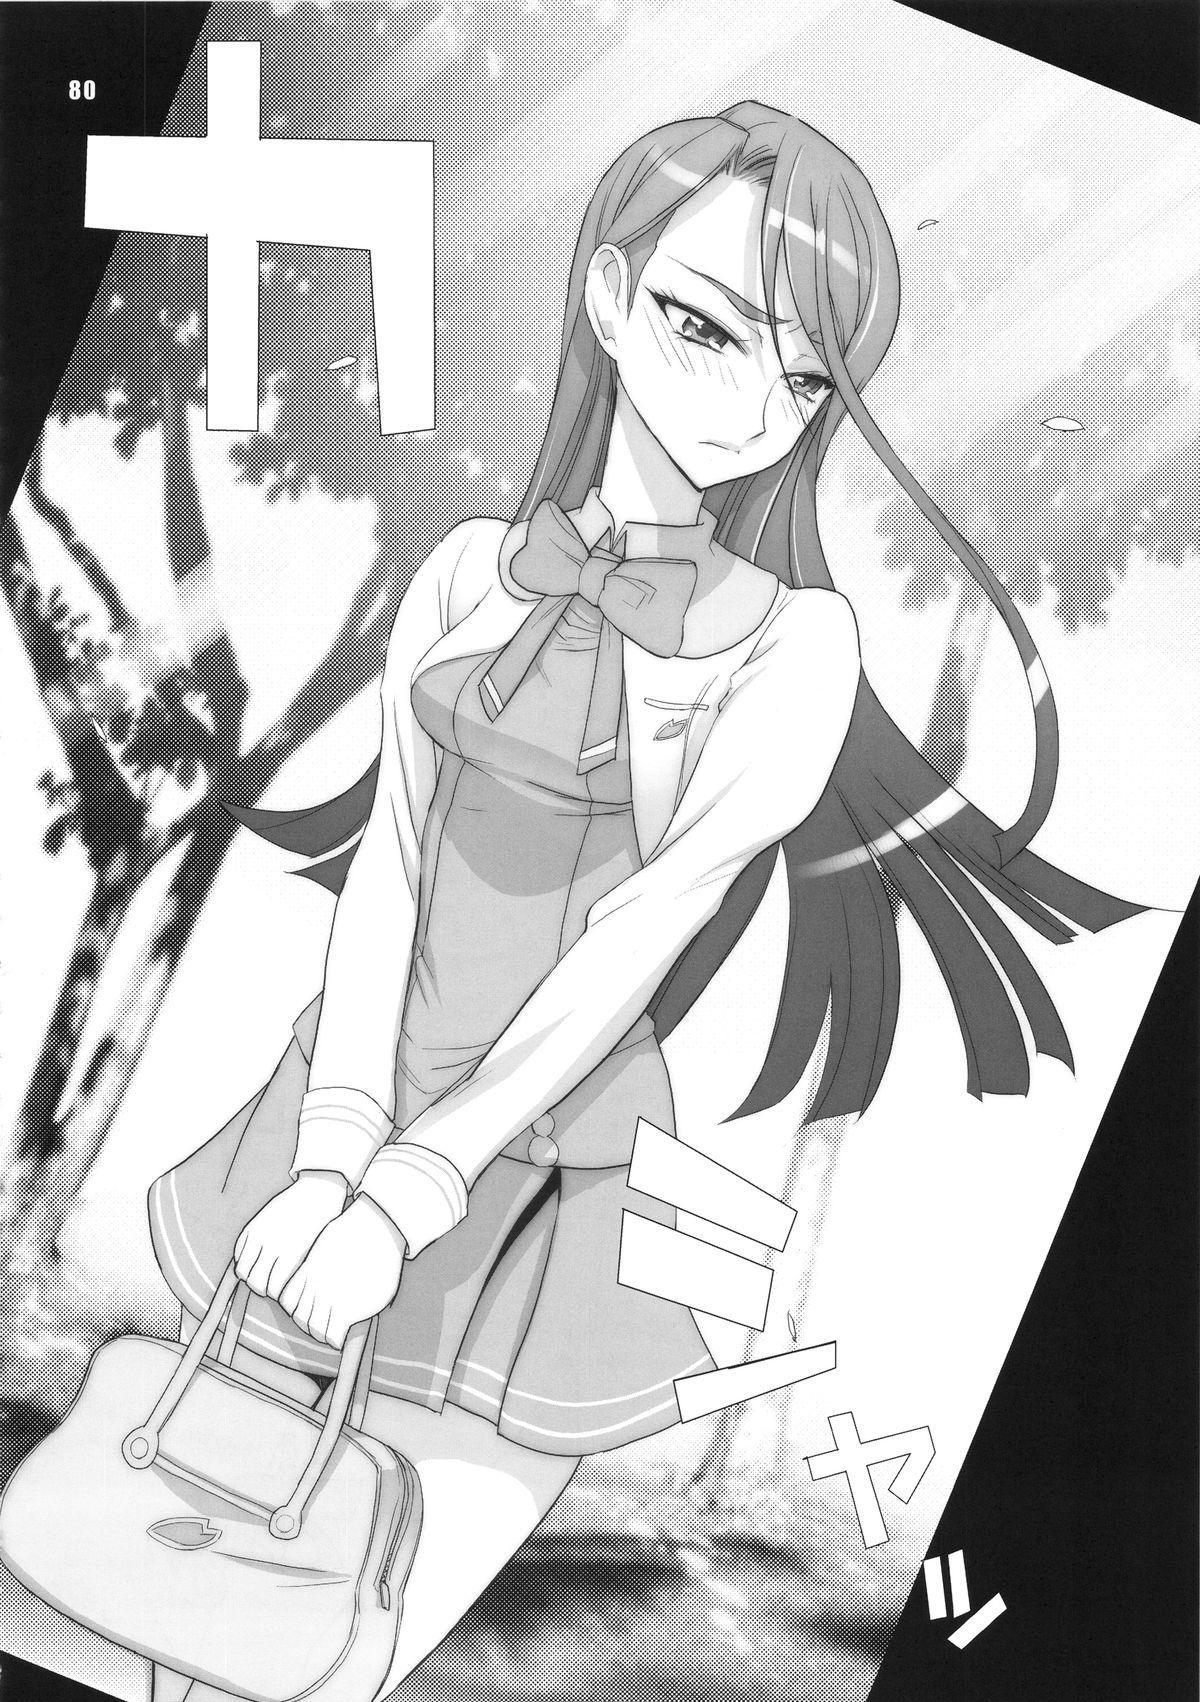 Inazuma Pretty Warrior 78